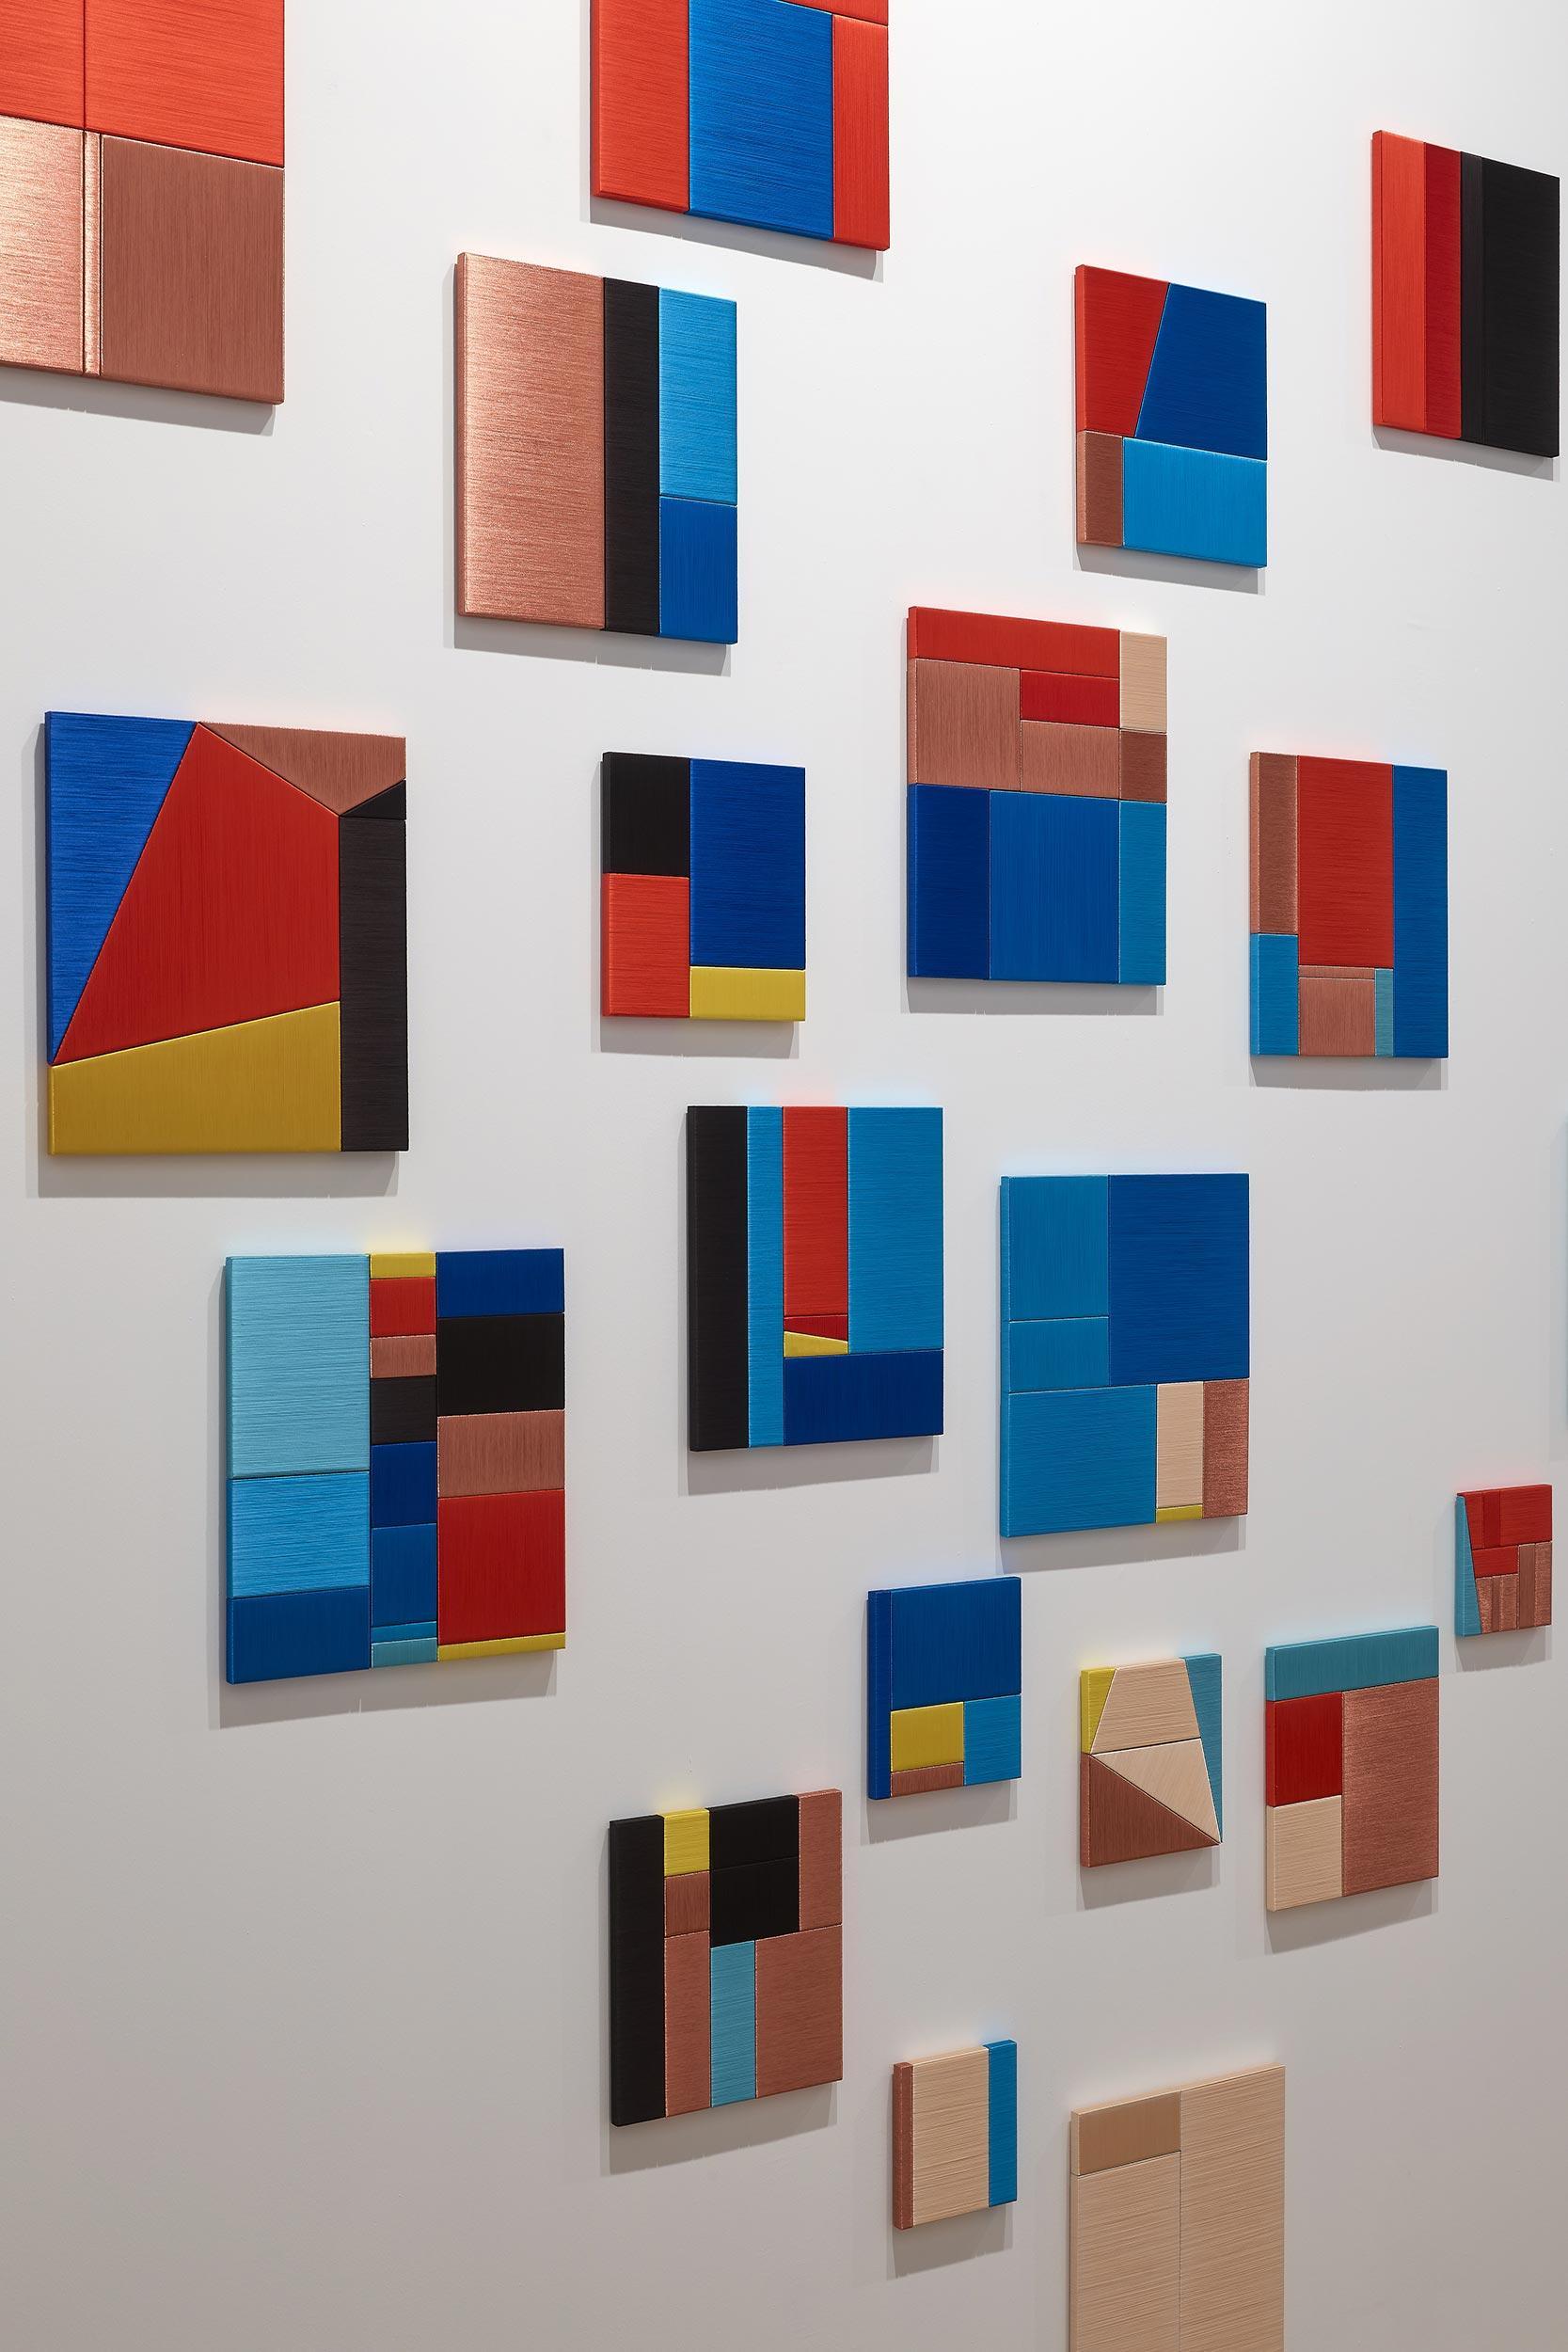 Prix Marcel Duchamp 2020